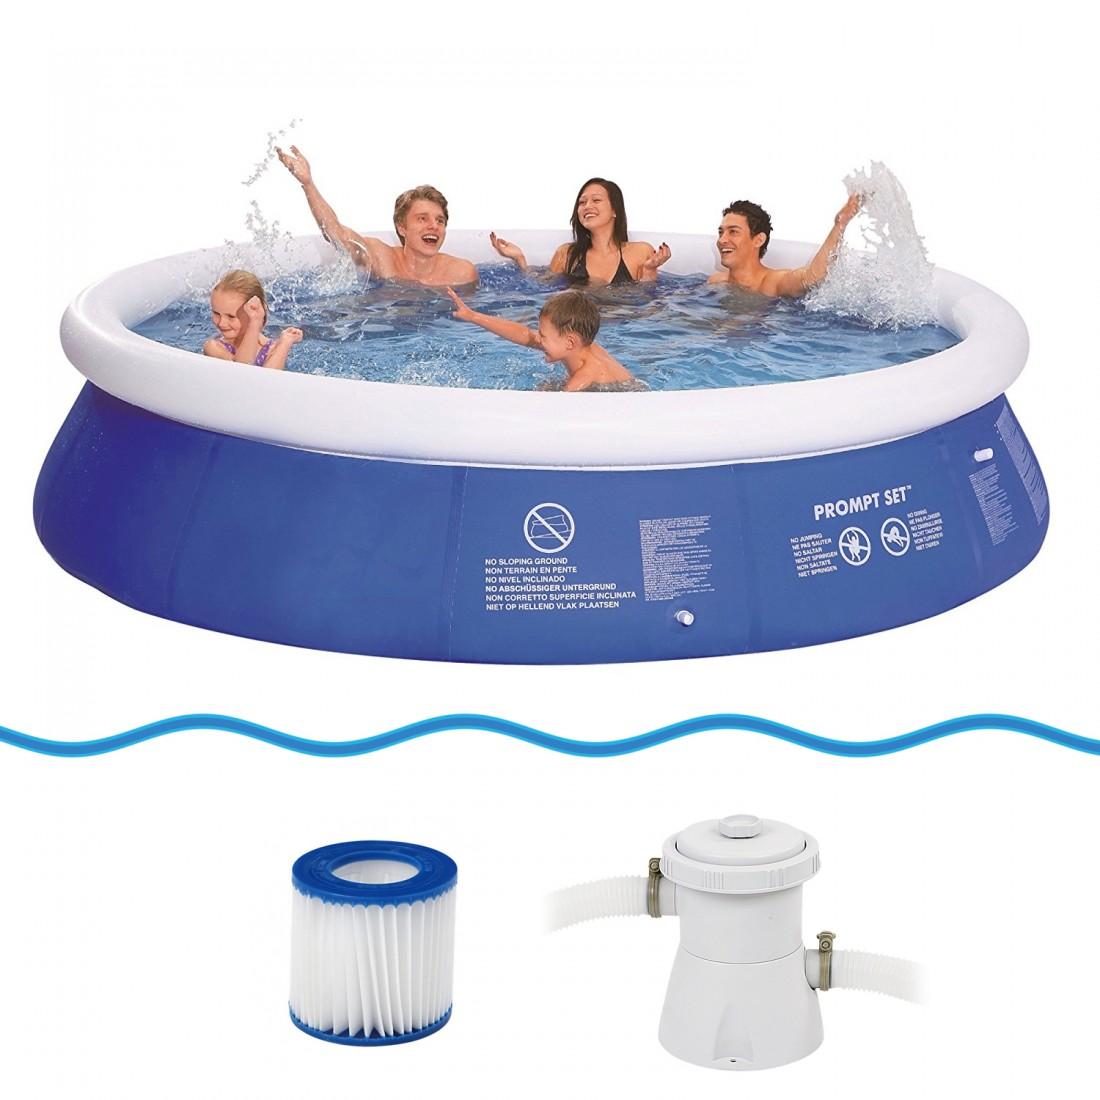 Buy jilong prompt set pool marin blue 360 set quick up for Quick up pool obi